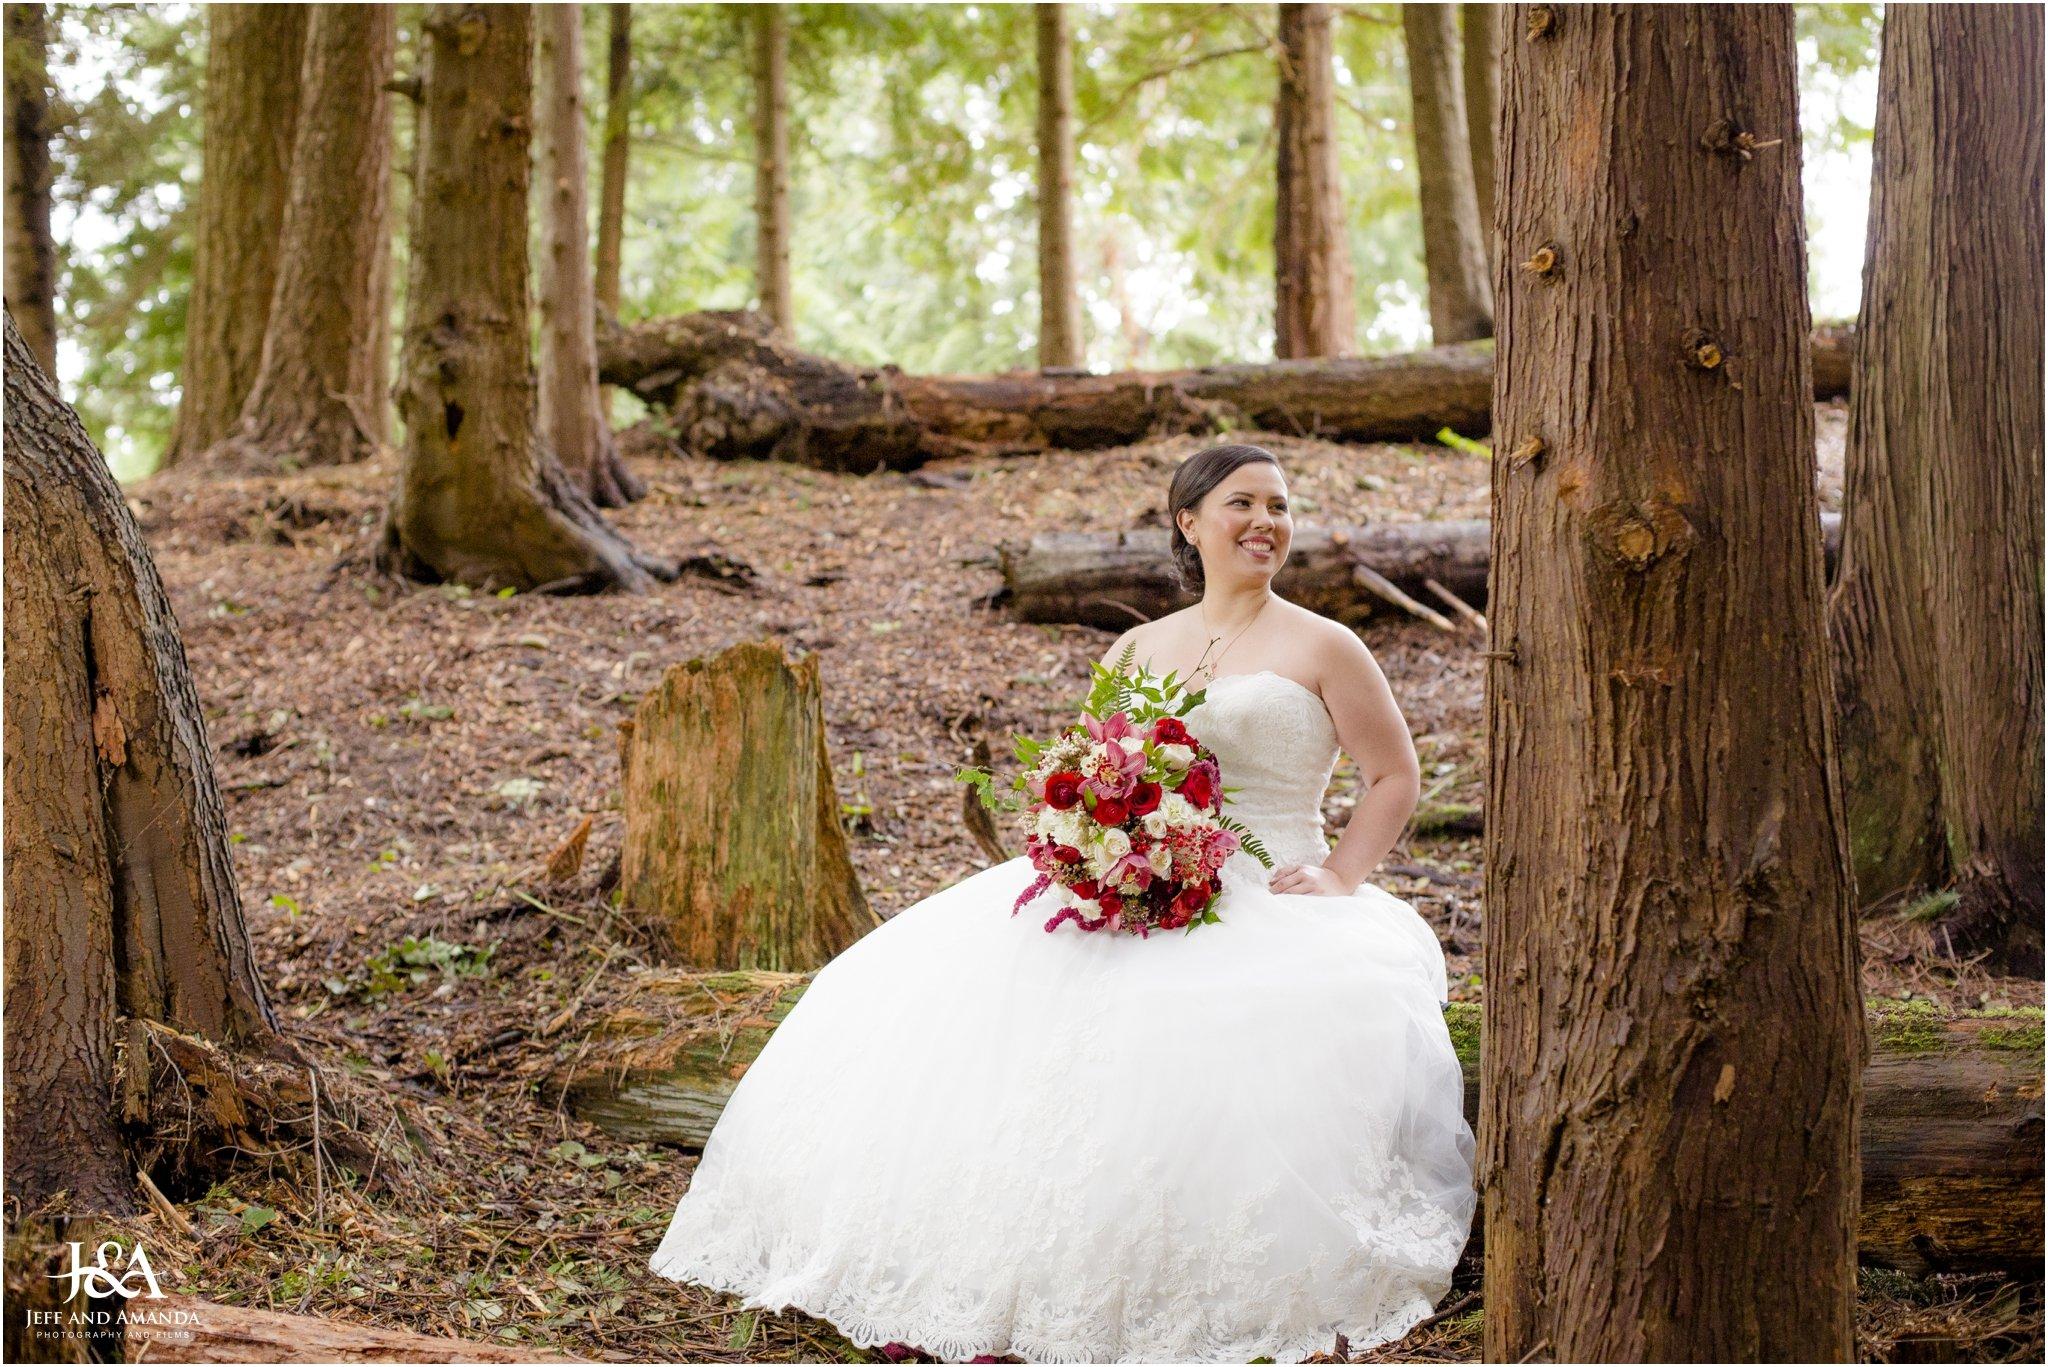 Dave and Kari s Wedding-Facebook Ready-0159.jpg